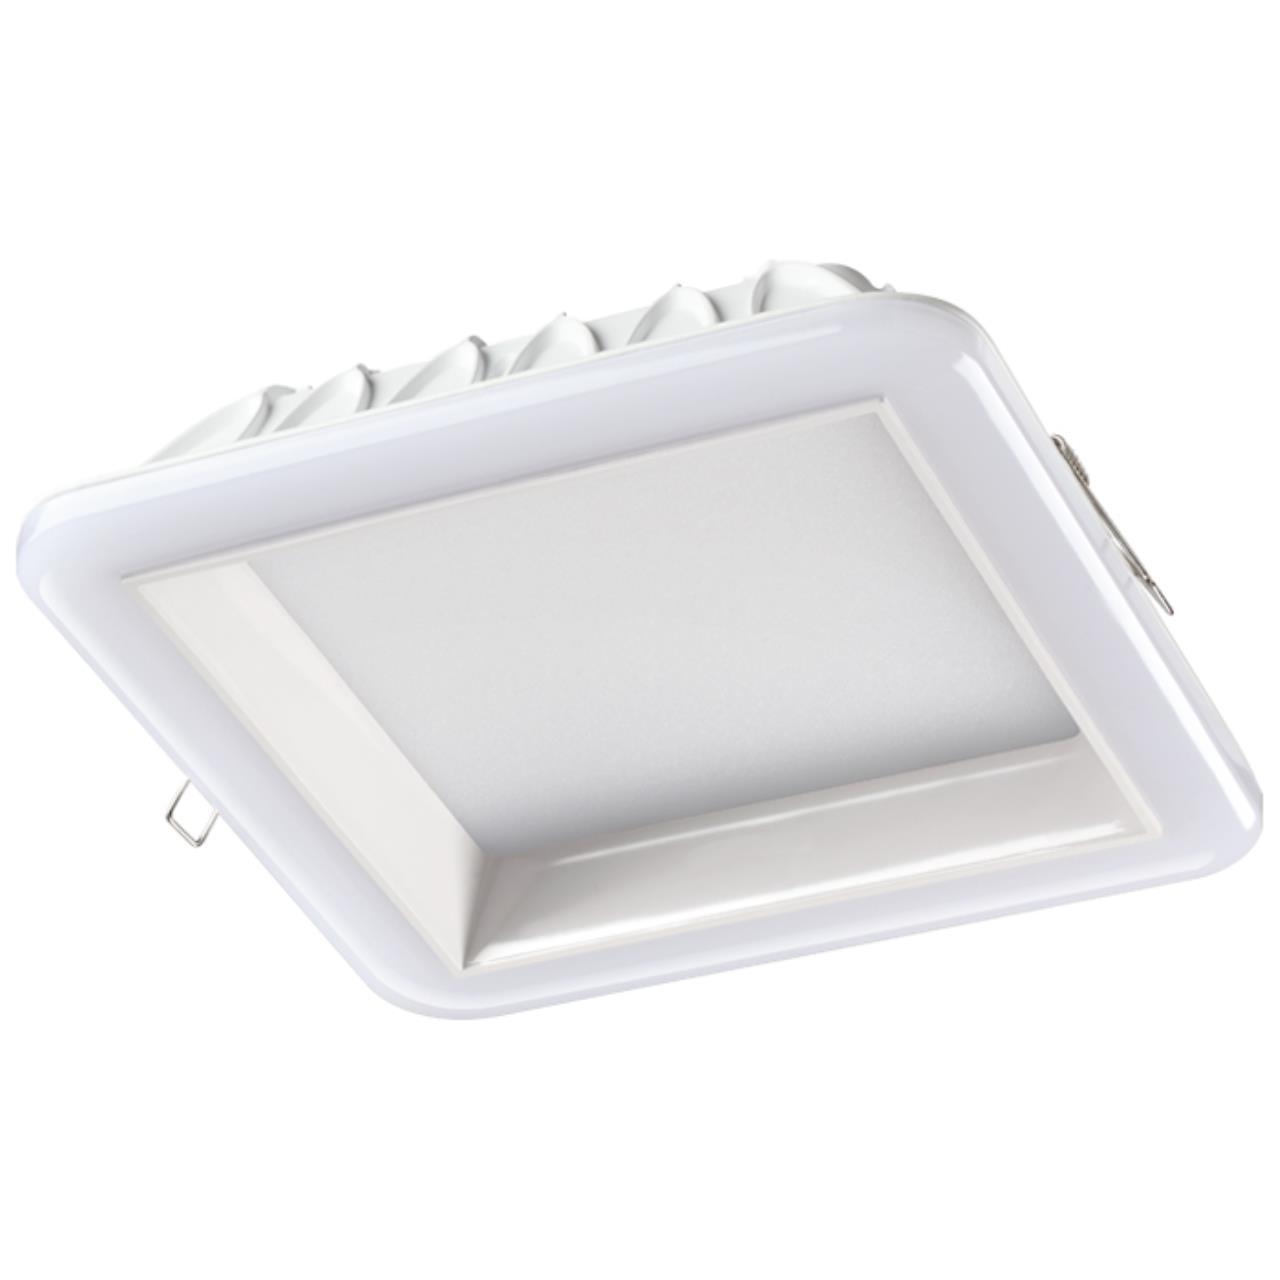 358285 SPOT NT19 000 белый Светильник встраиваемый IP20 4000K LED 32W 85-265V JOIA